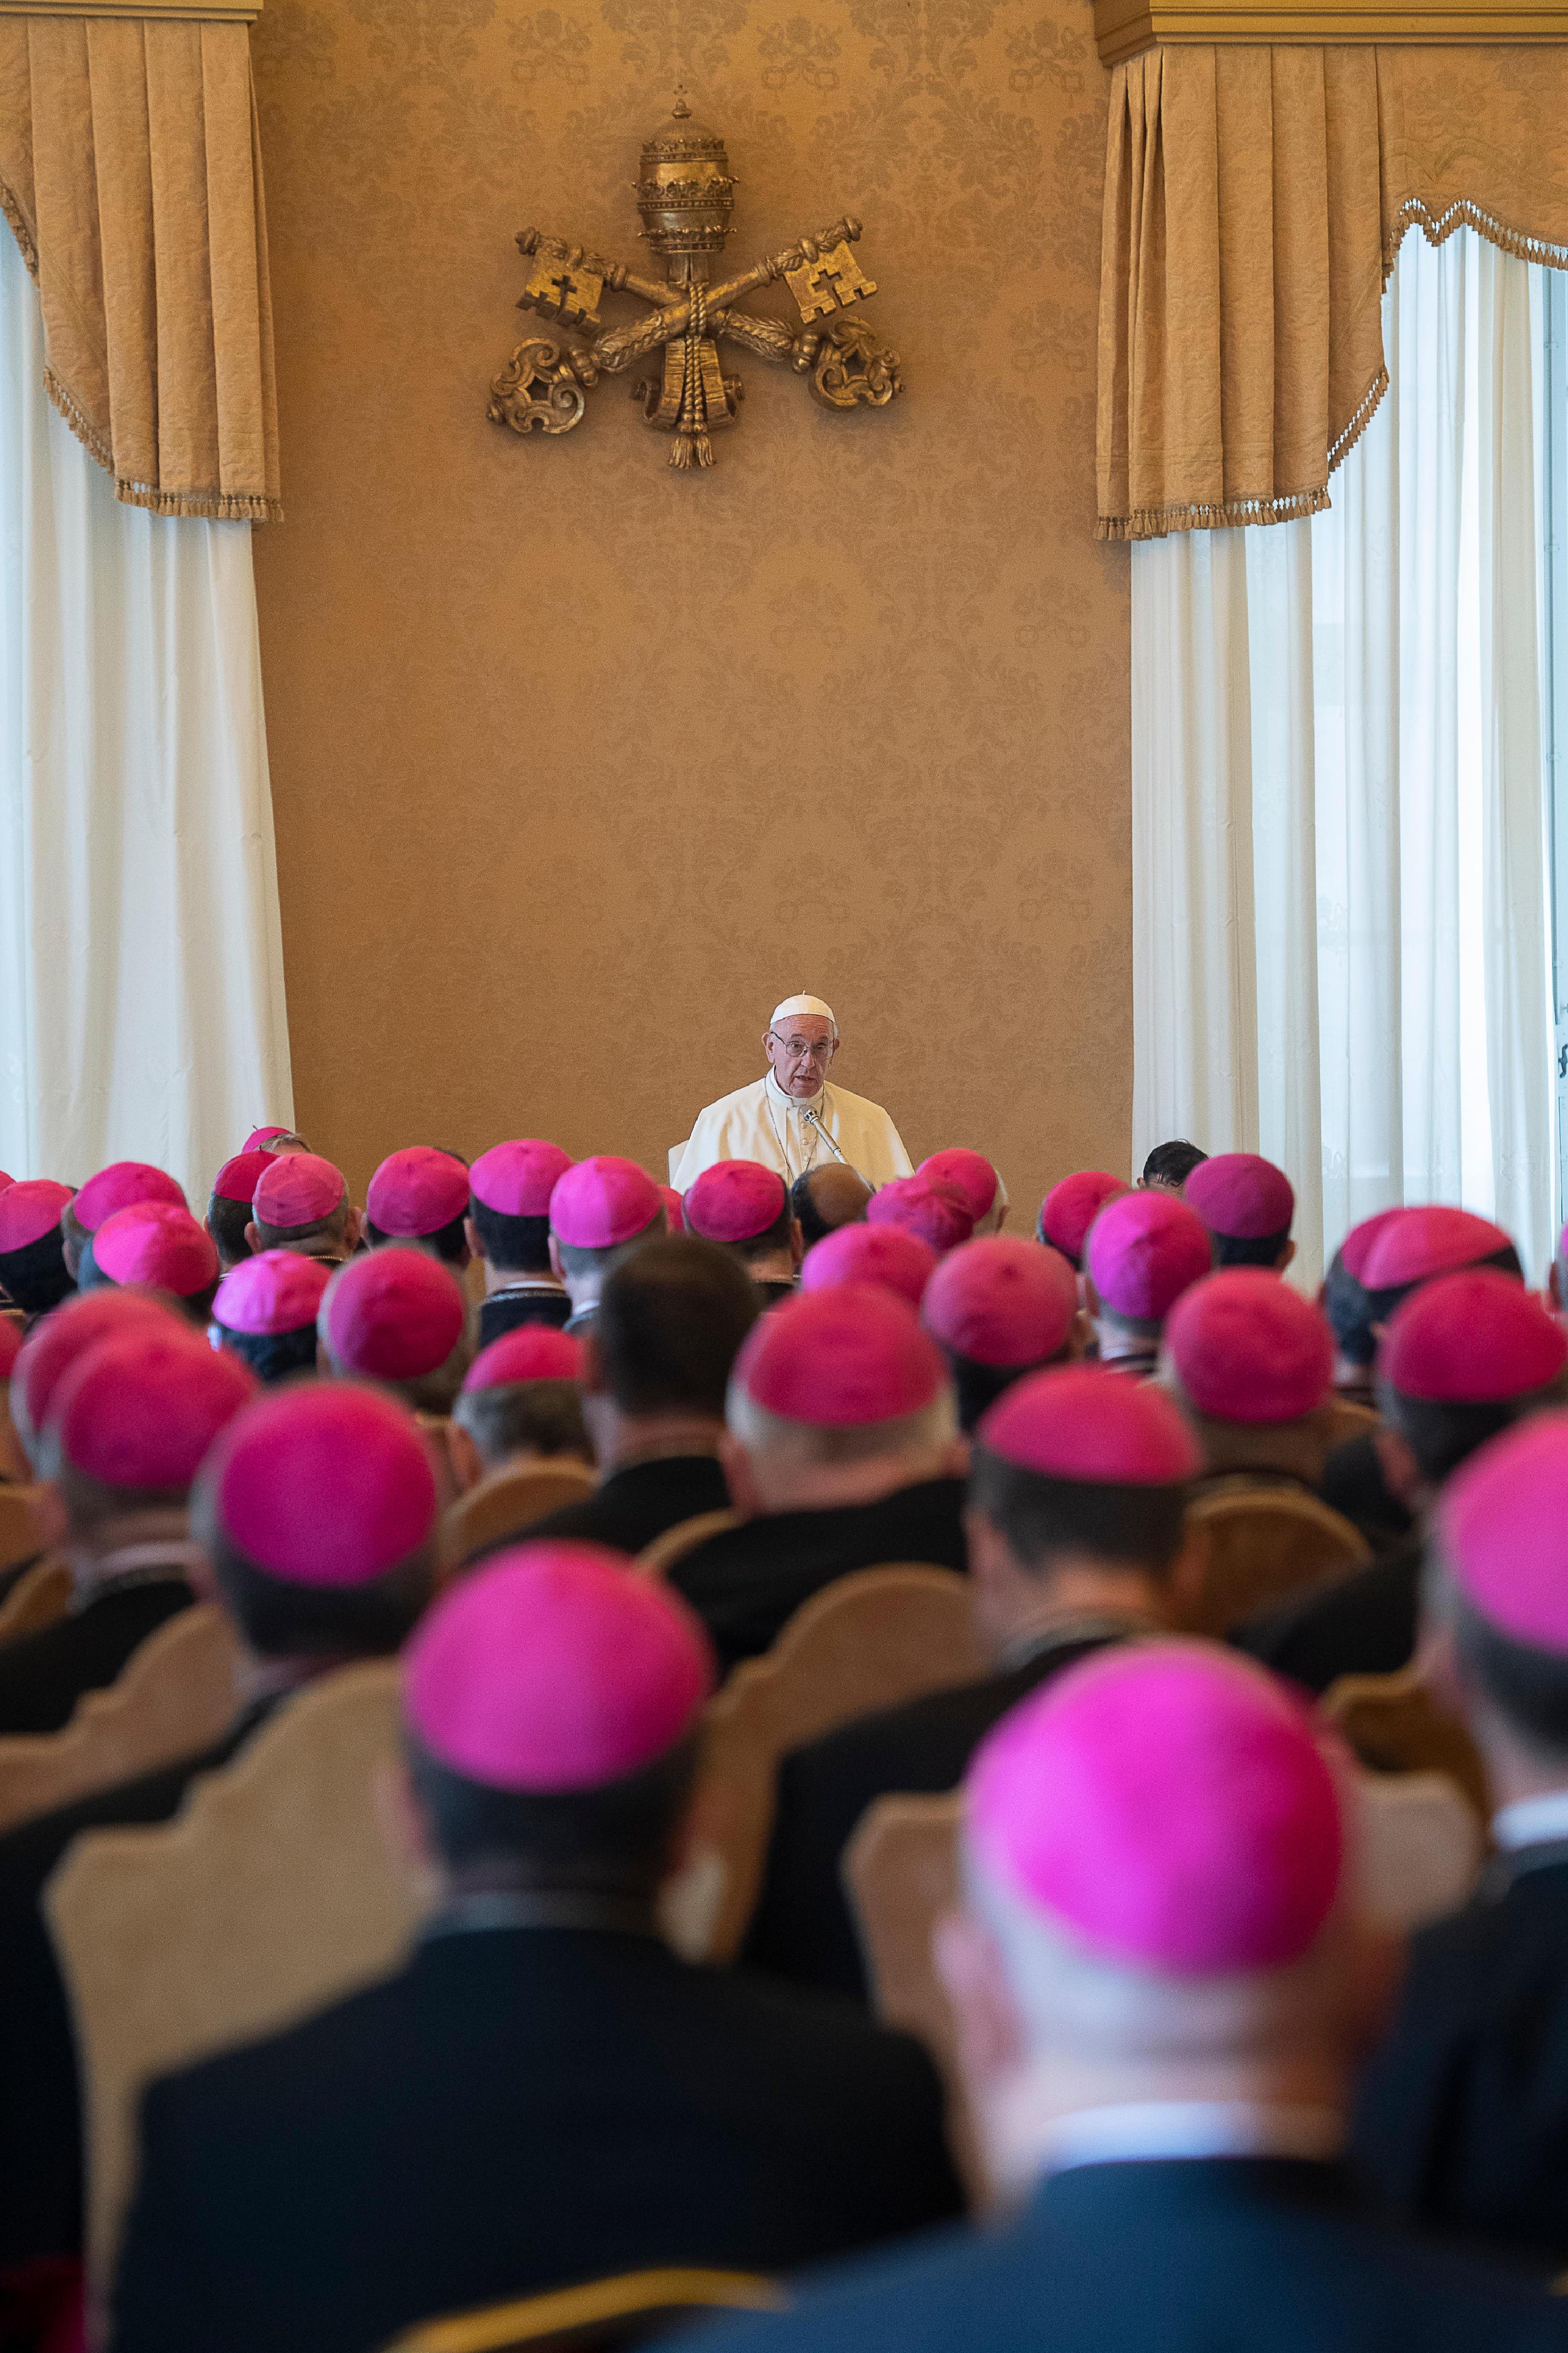 Evêques des Eglises orientales catholiques, 13 sept. 2018 © Vatican Media